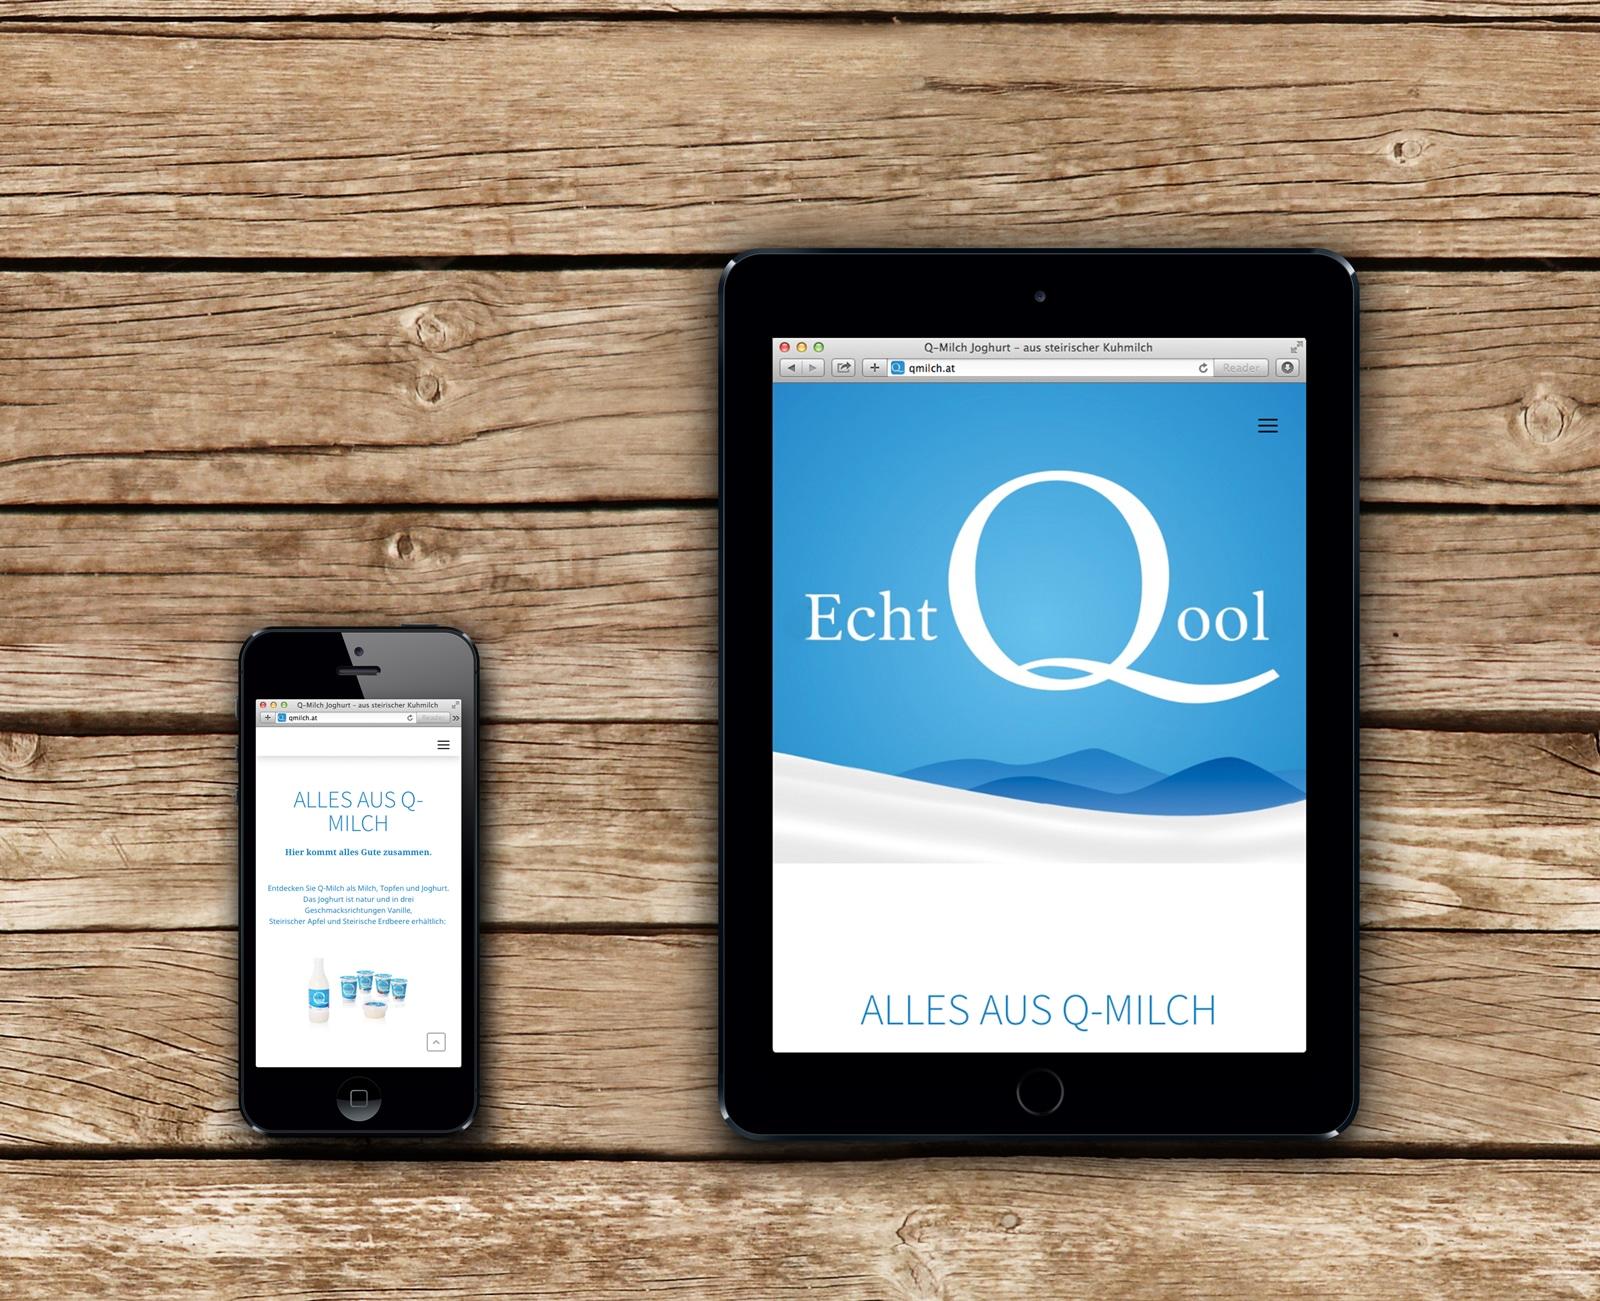 qmilch_Screen2_iPhone+iPad_auf-Holz